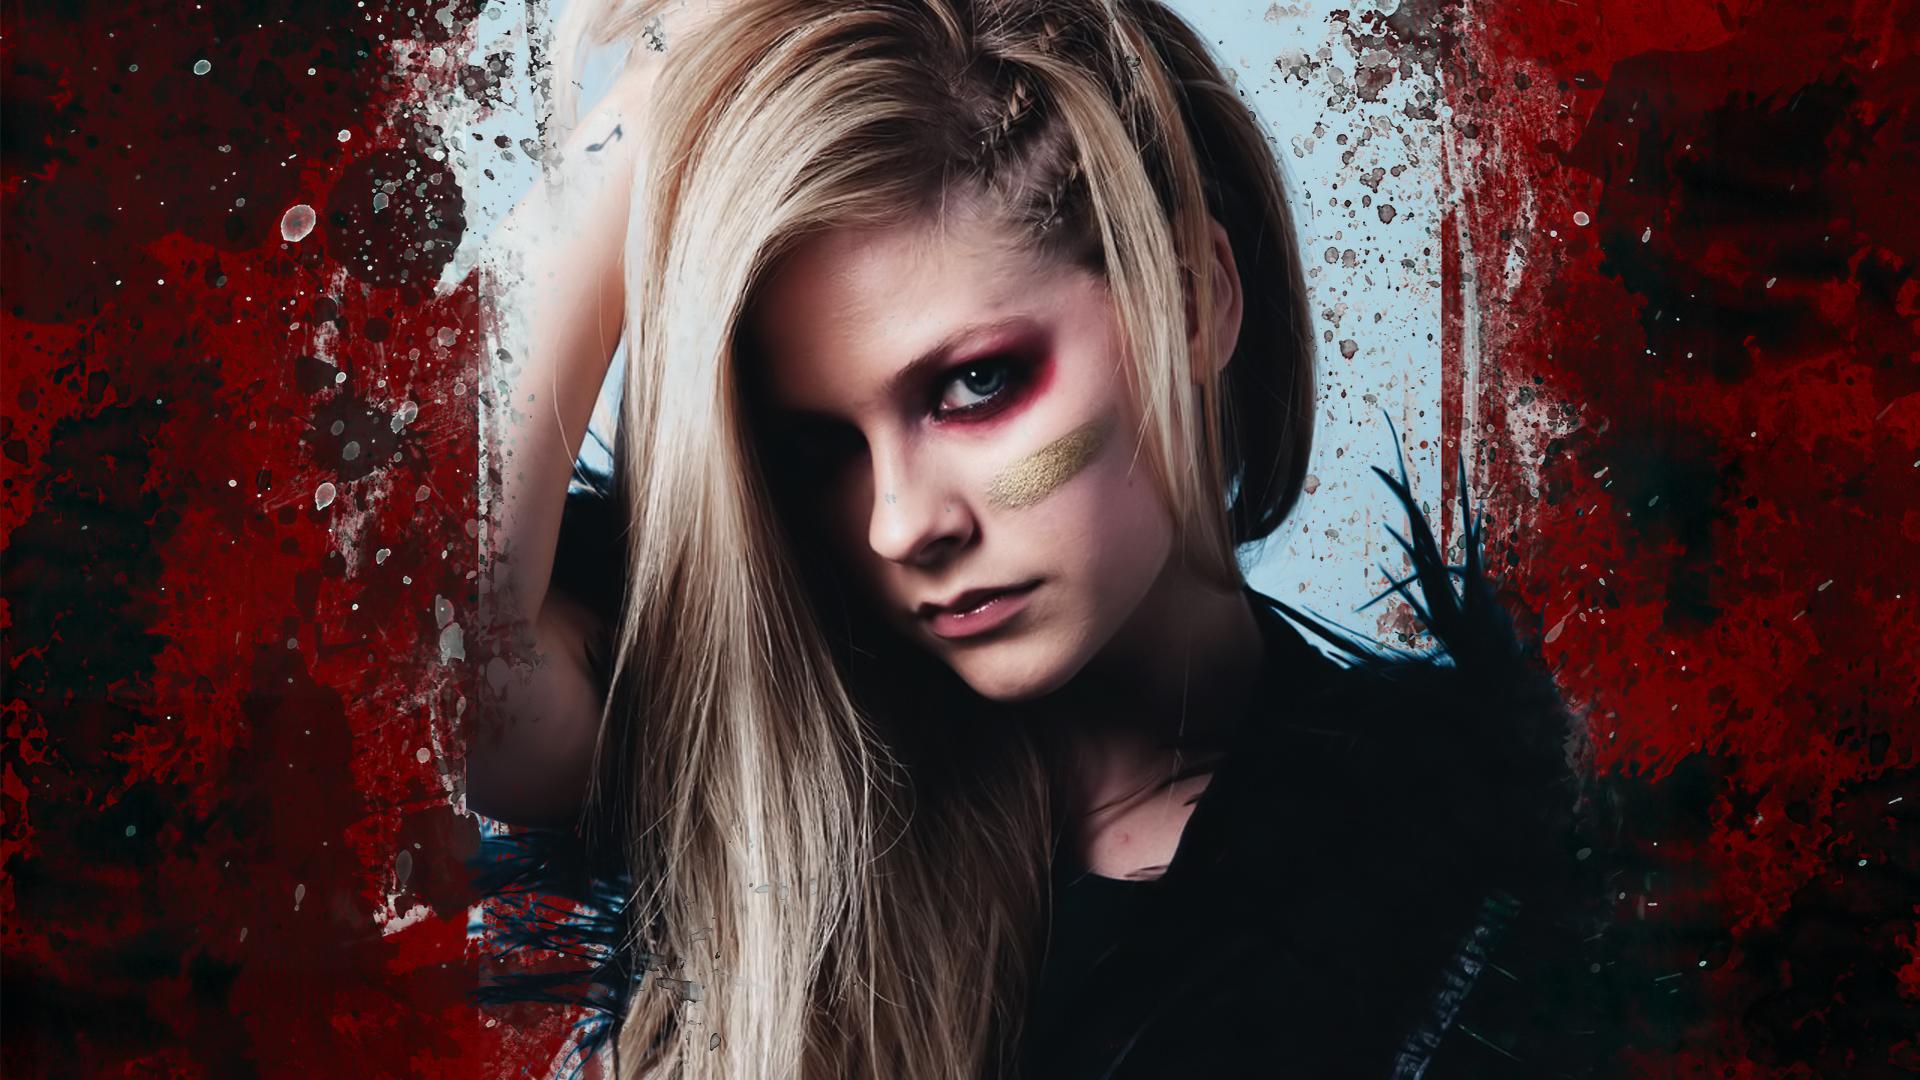 Avril Lavigne 2015 Computer Desktop Background wallpaper 1920x1080